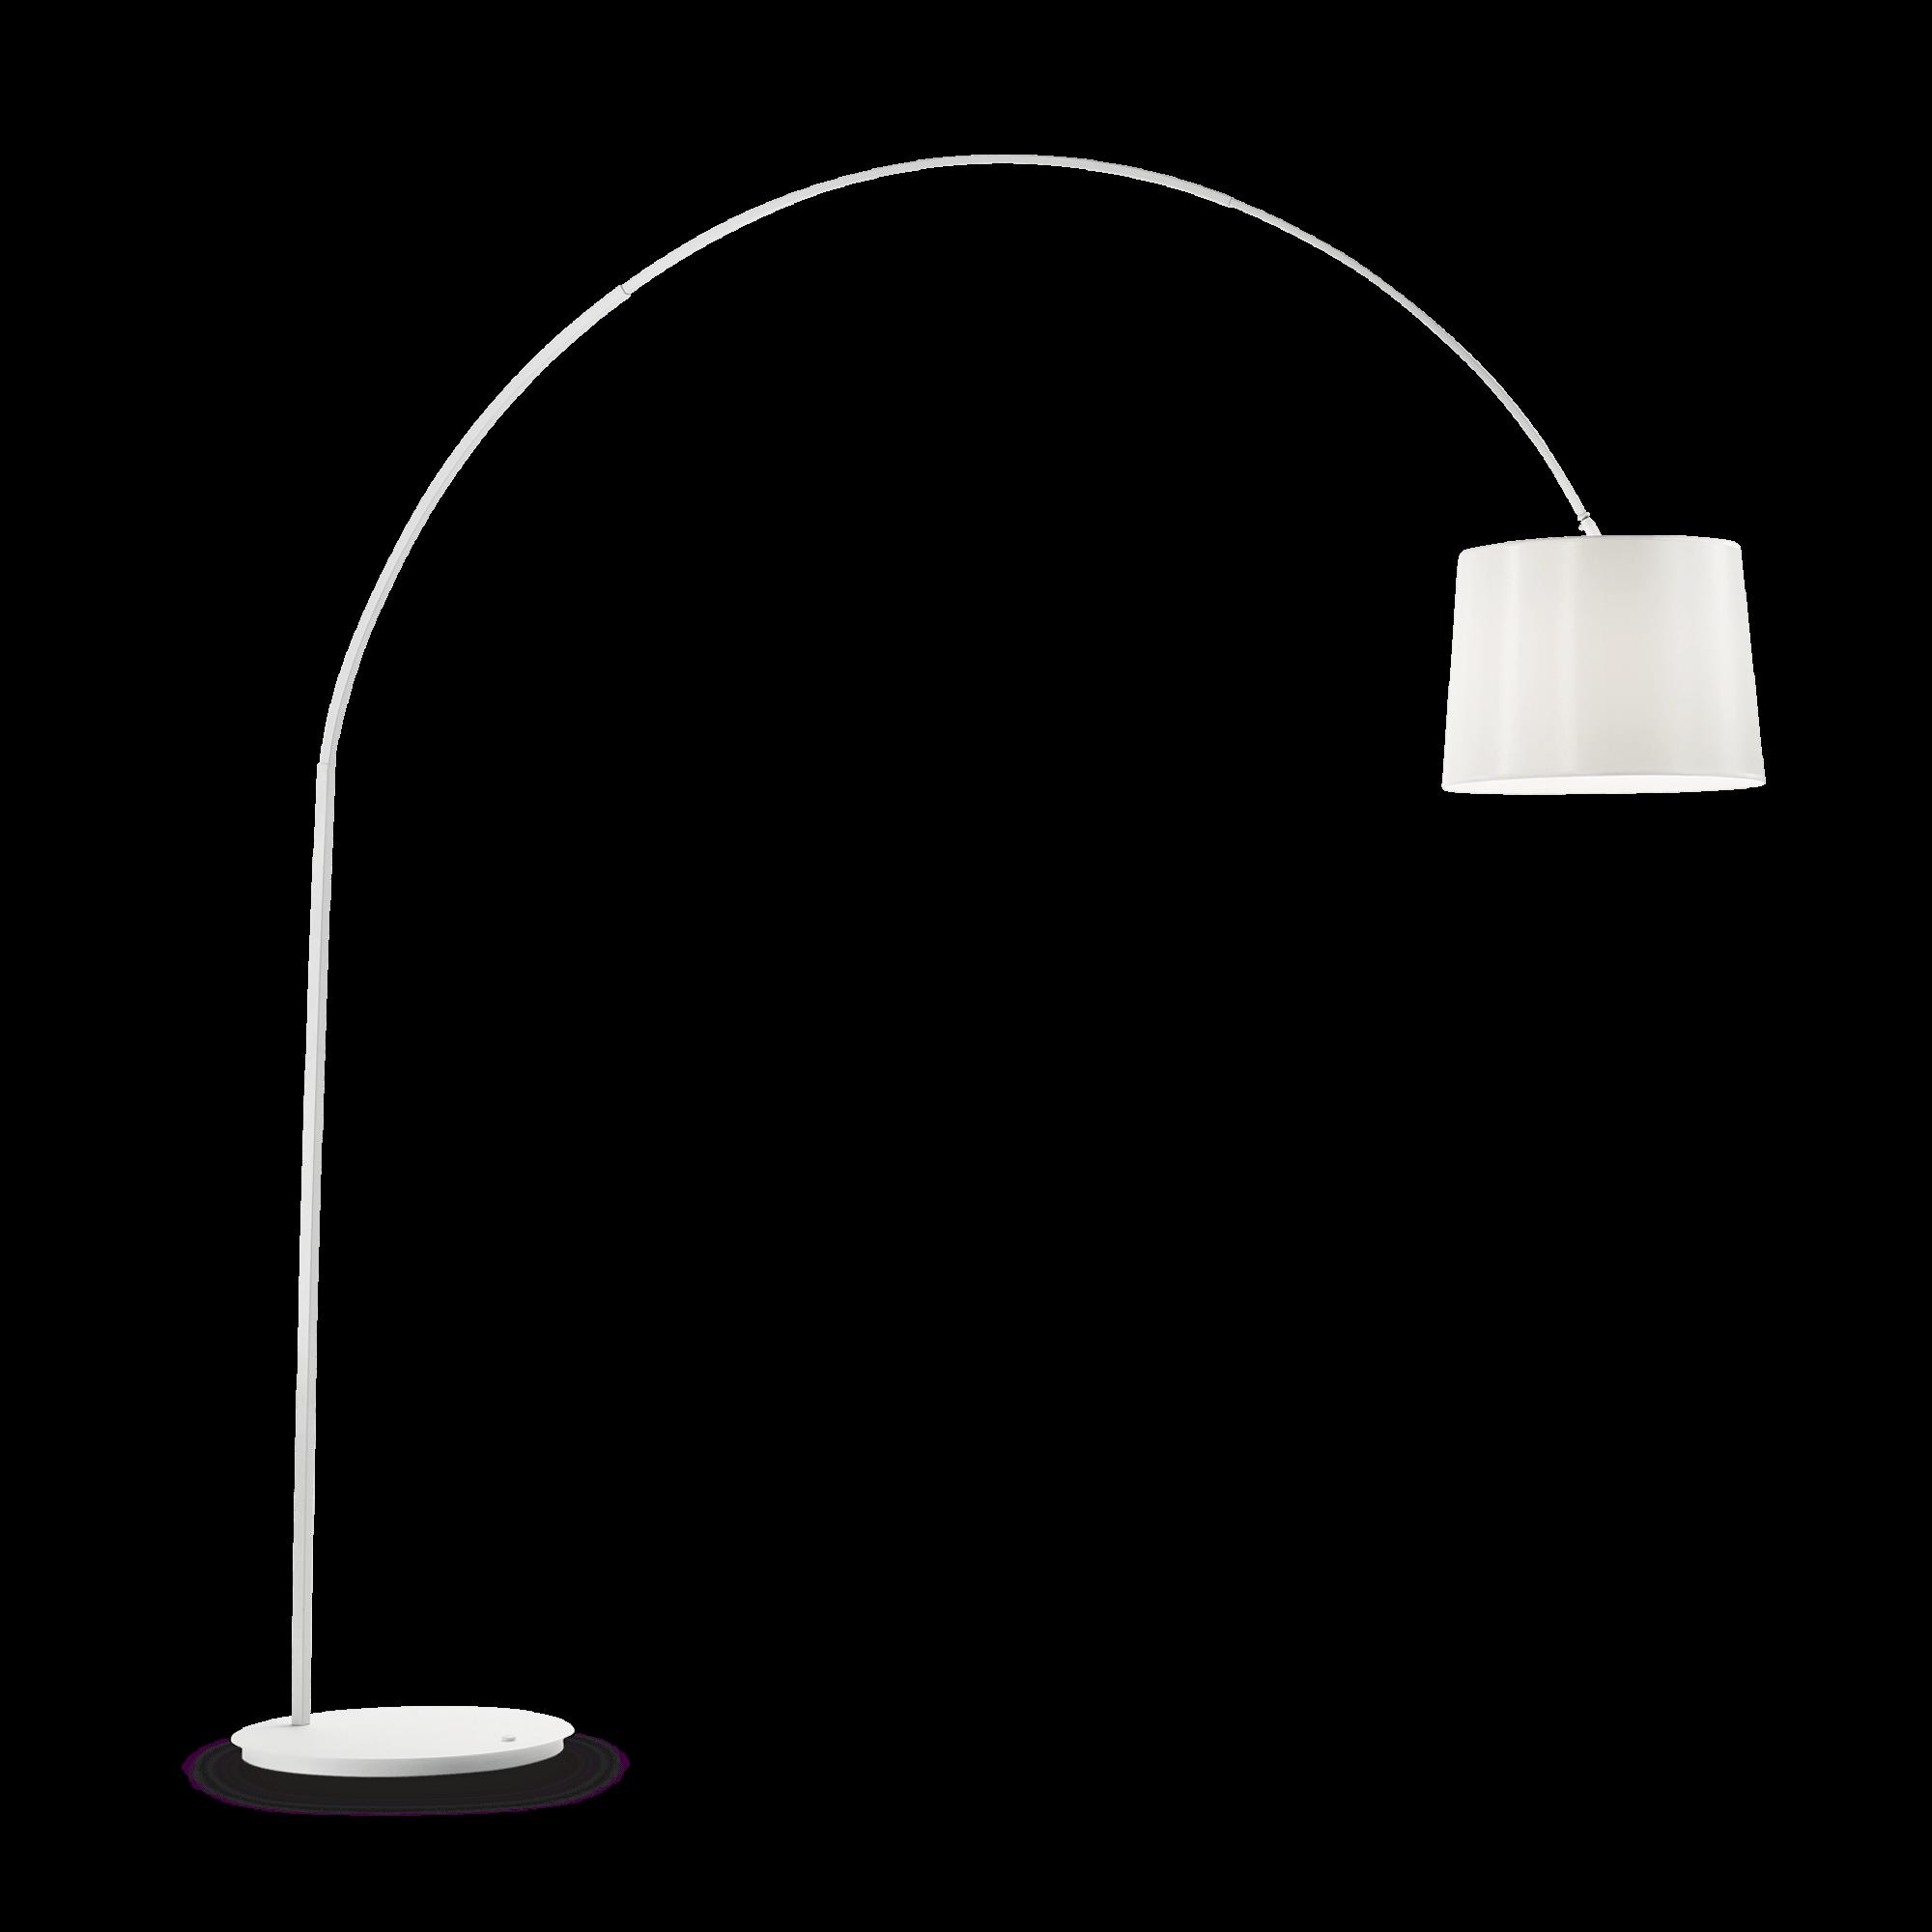 Ideal Lux 095127 Dorsale PT1 Total Bianco állólámpa